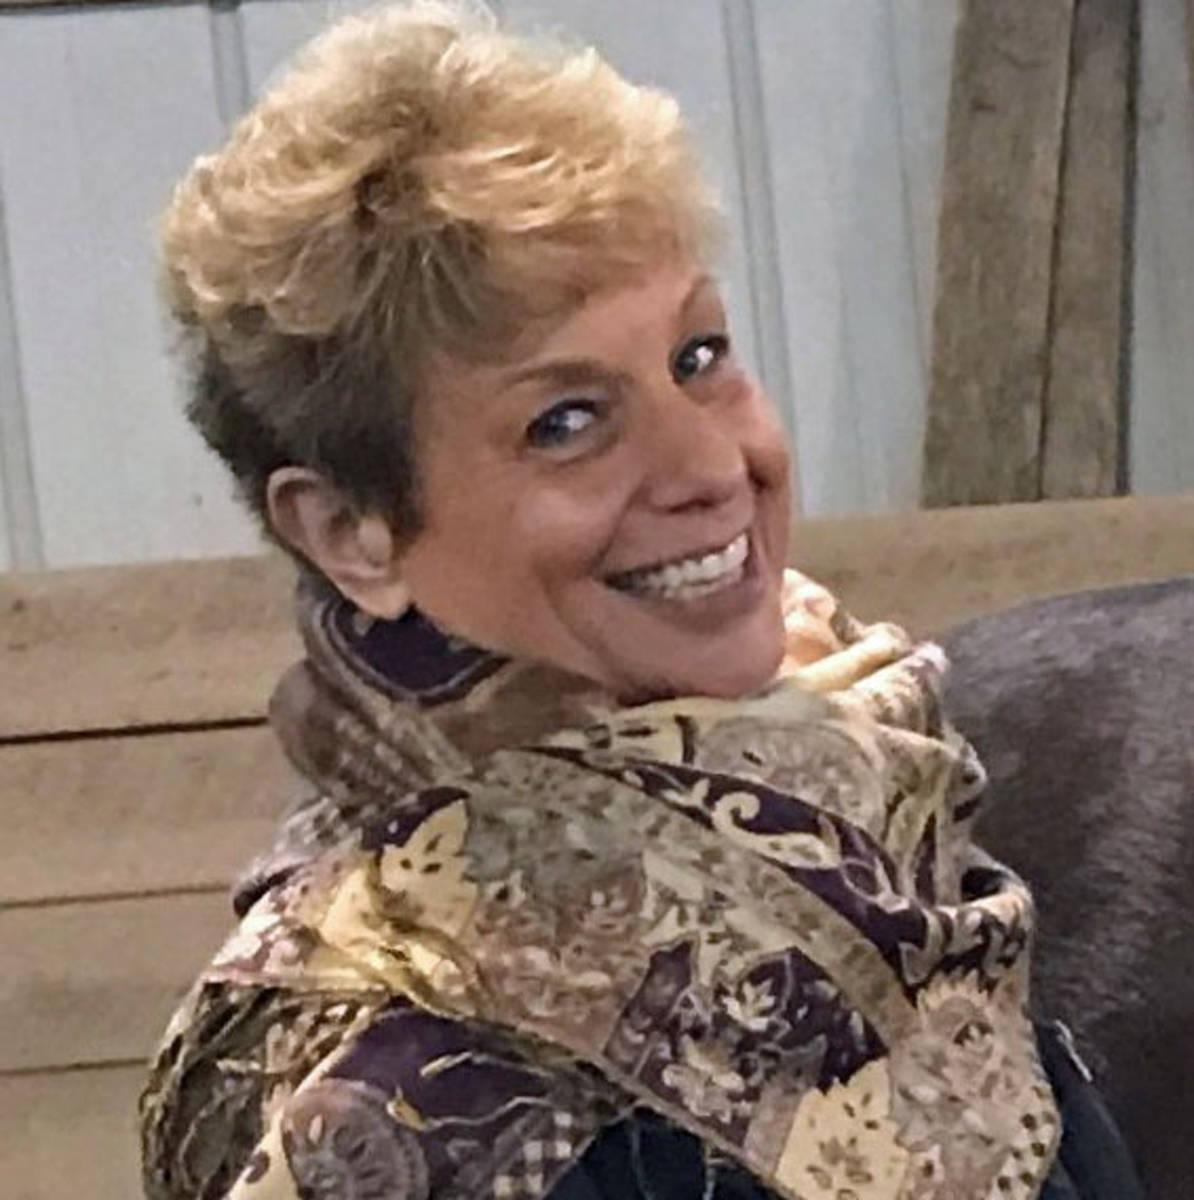 Dressage at Devon To Host Adult Amateur Seminar with Lisa Schmidt